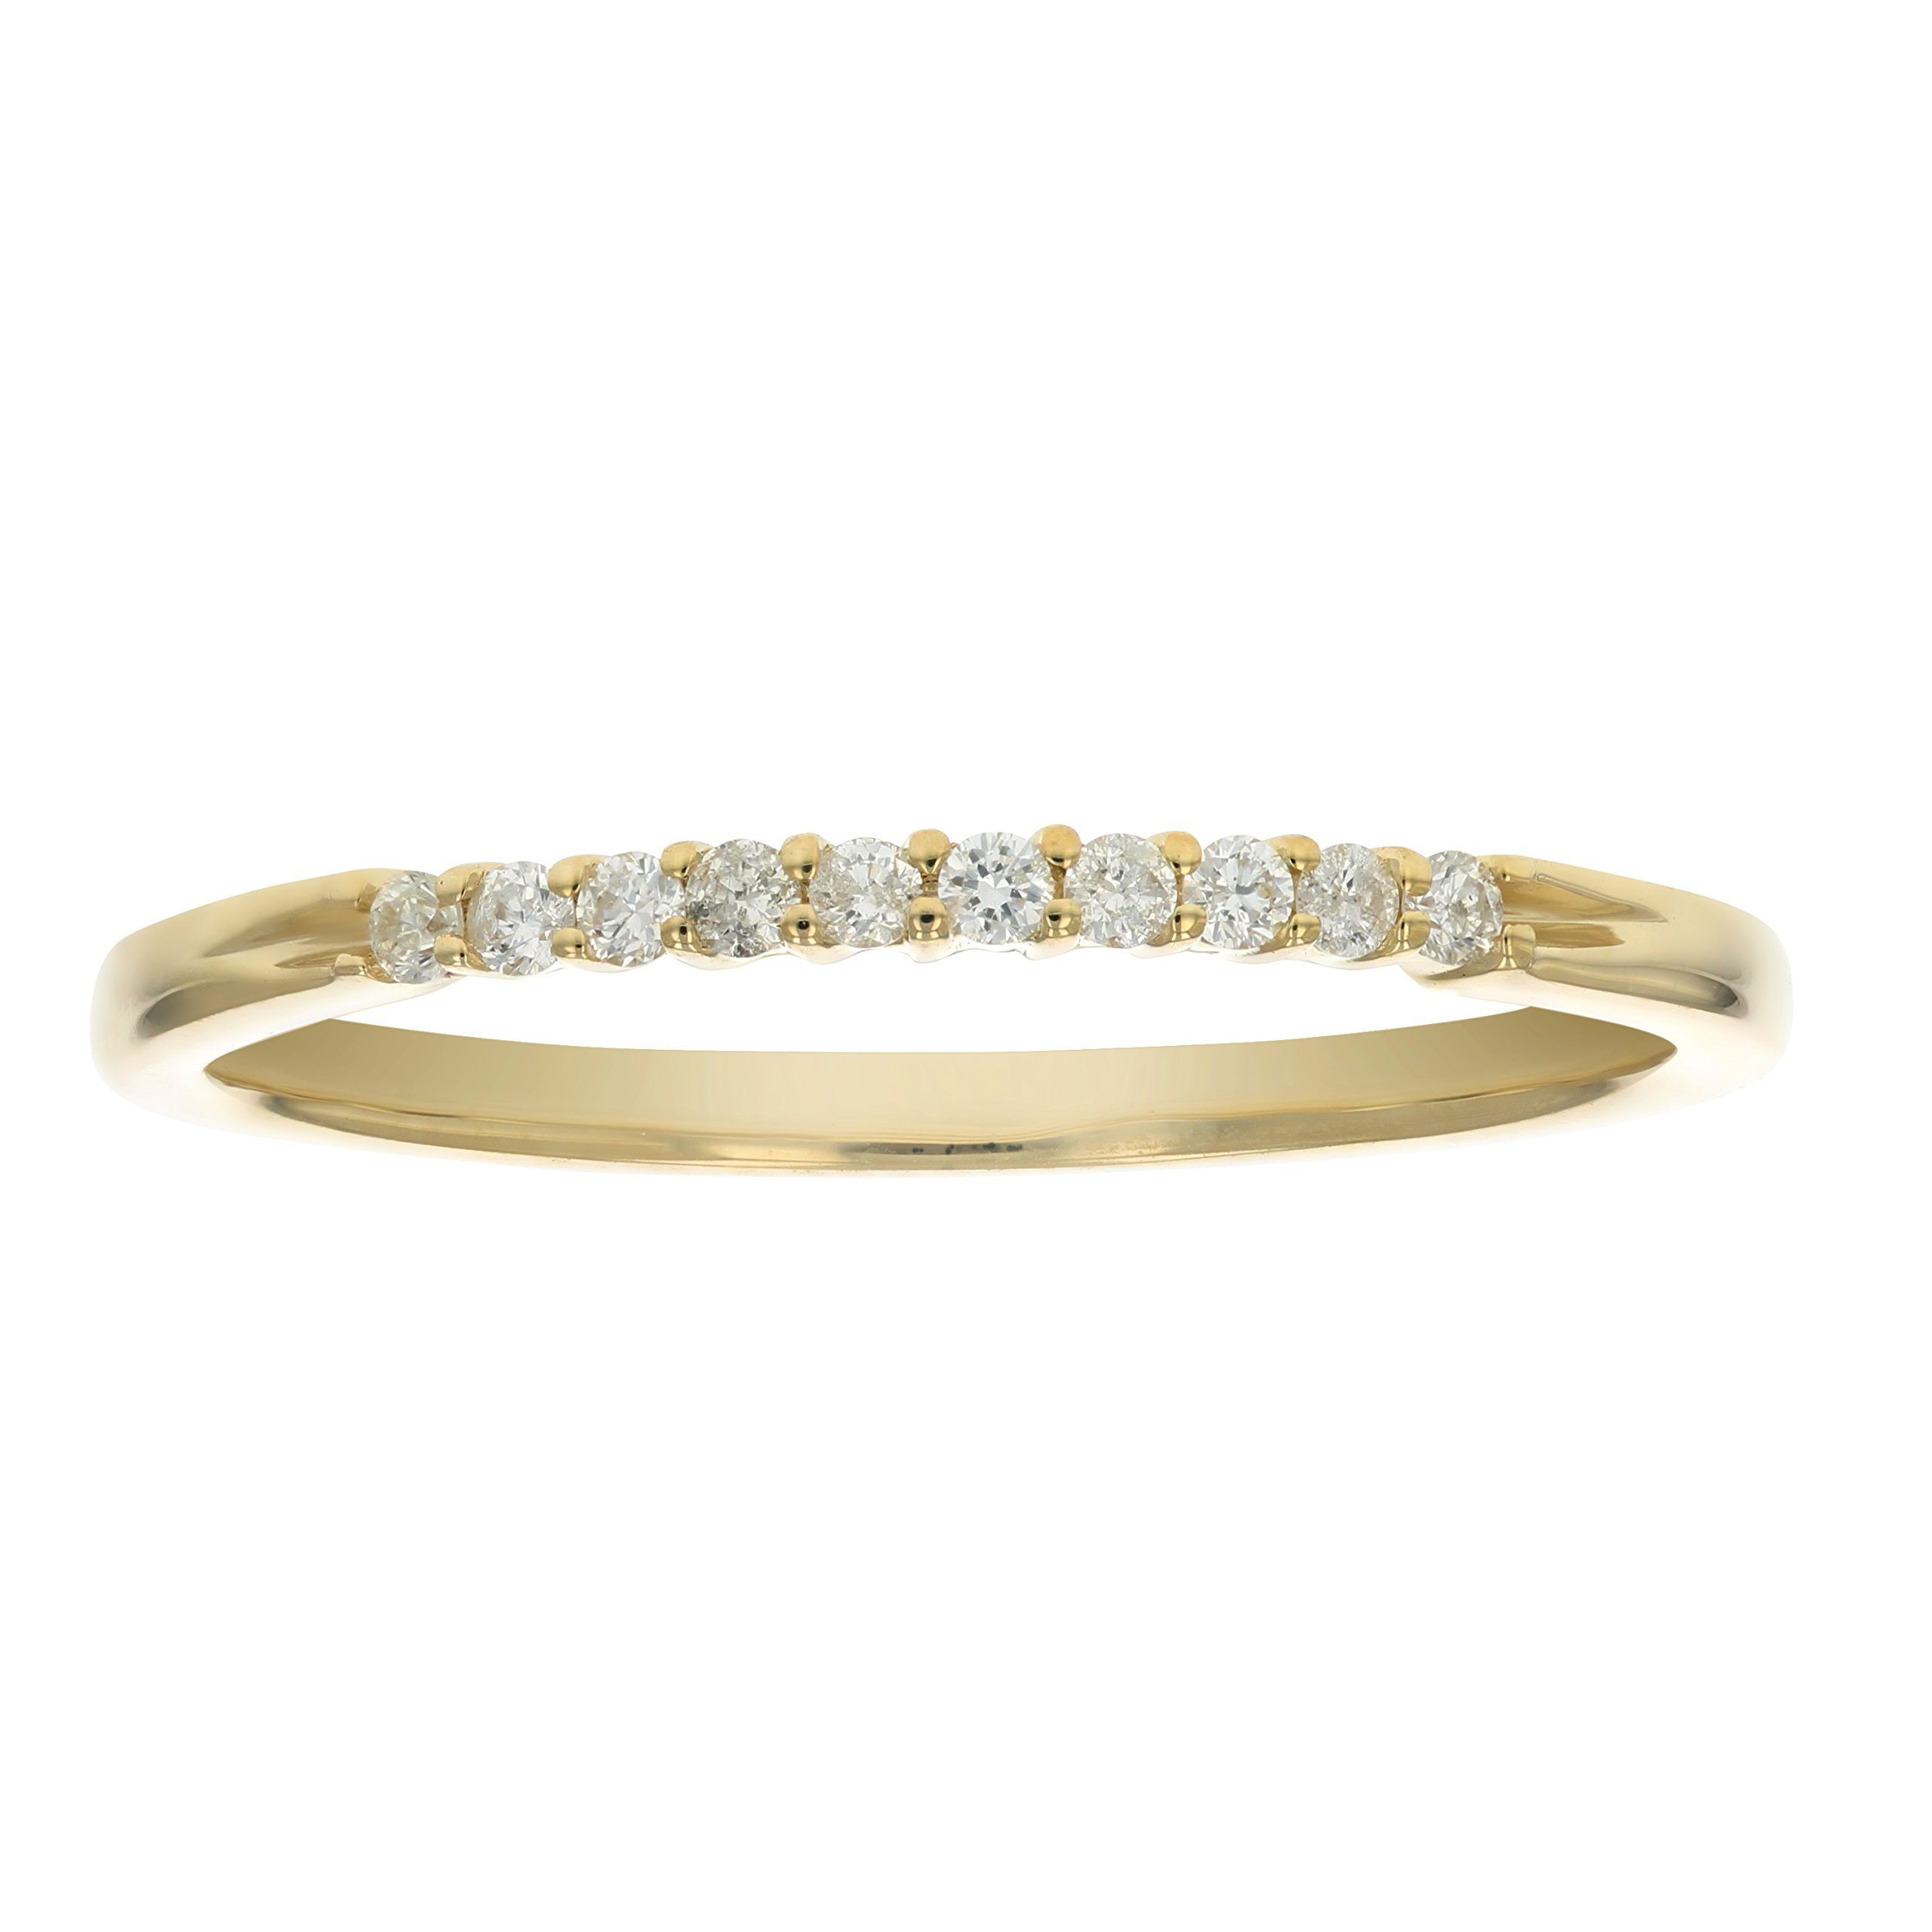 1/10 ctw Petite Diamond Wedding Band in 10K Yellow Gold In Size 7